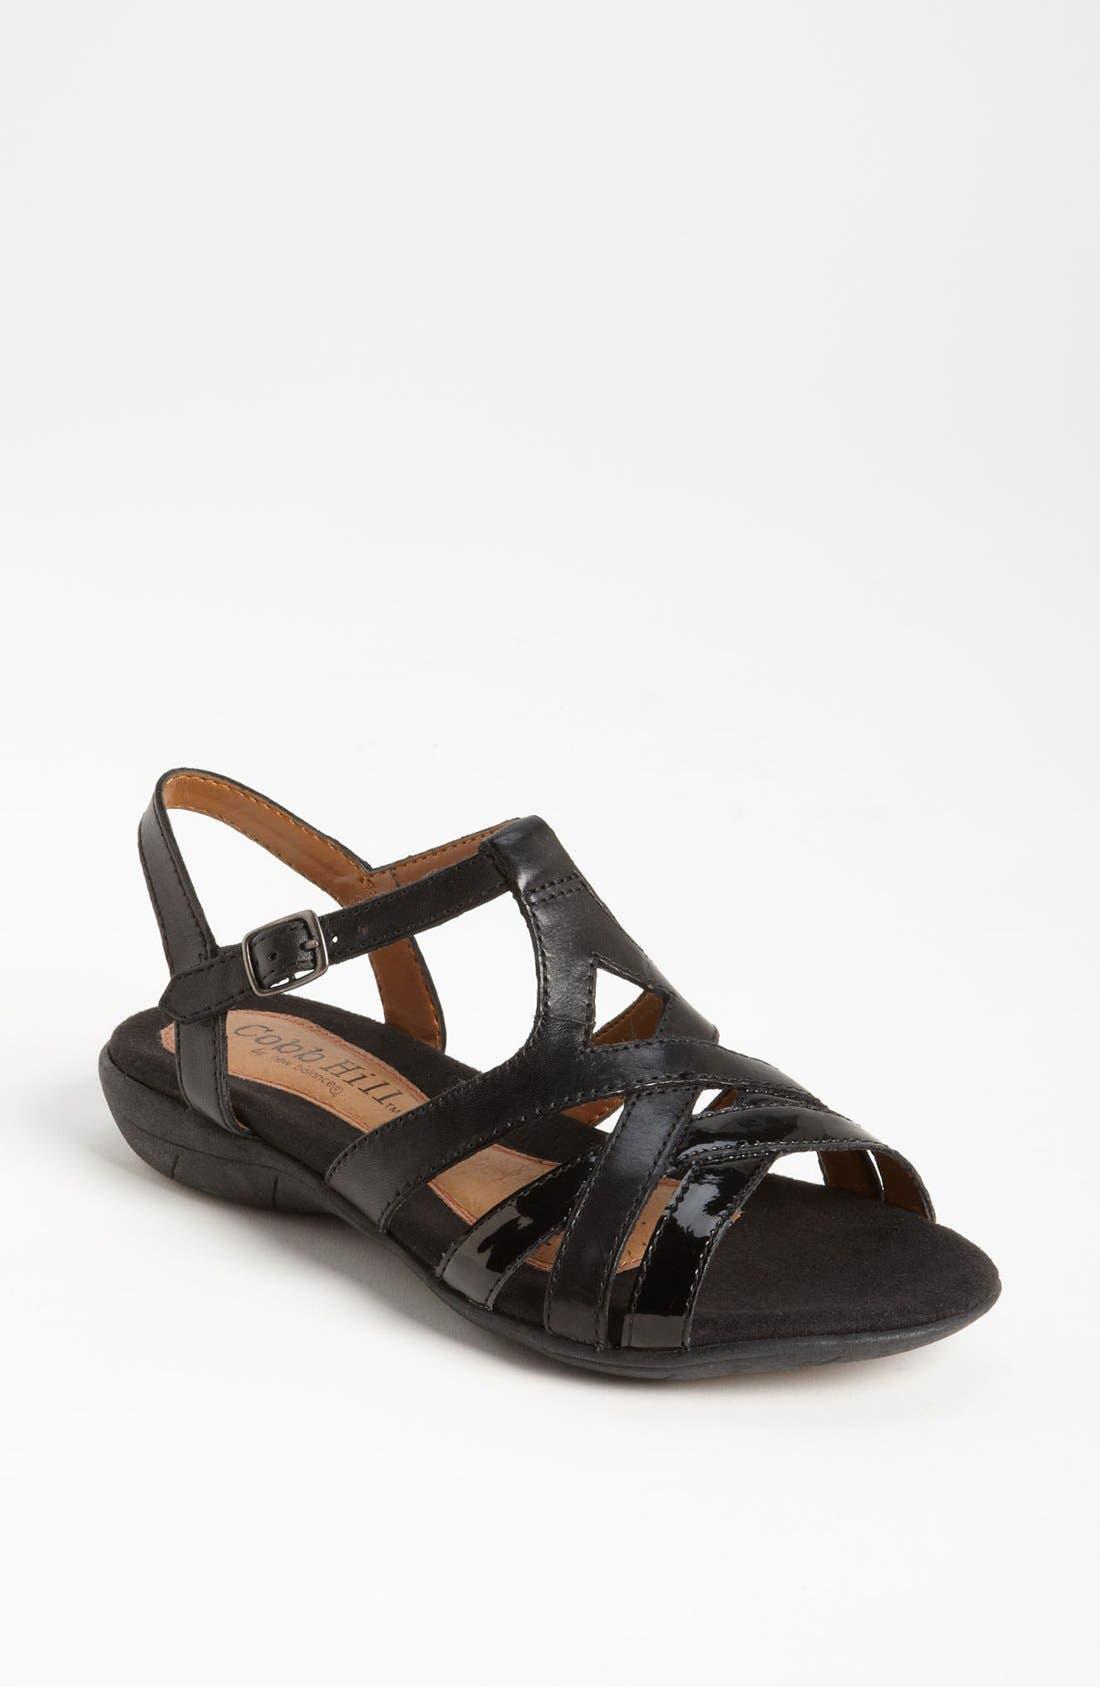 Main Image - Cobb Hill 'Willette' Sandal